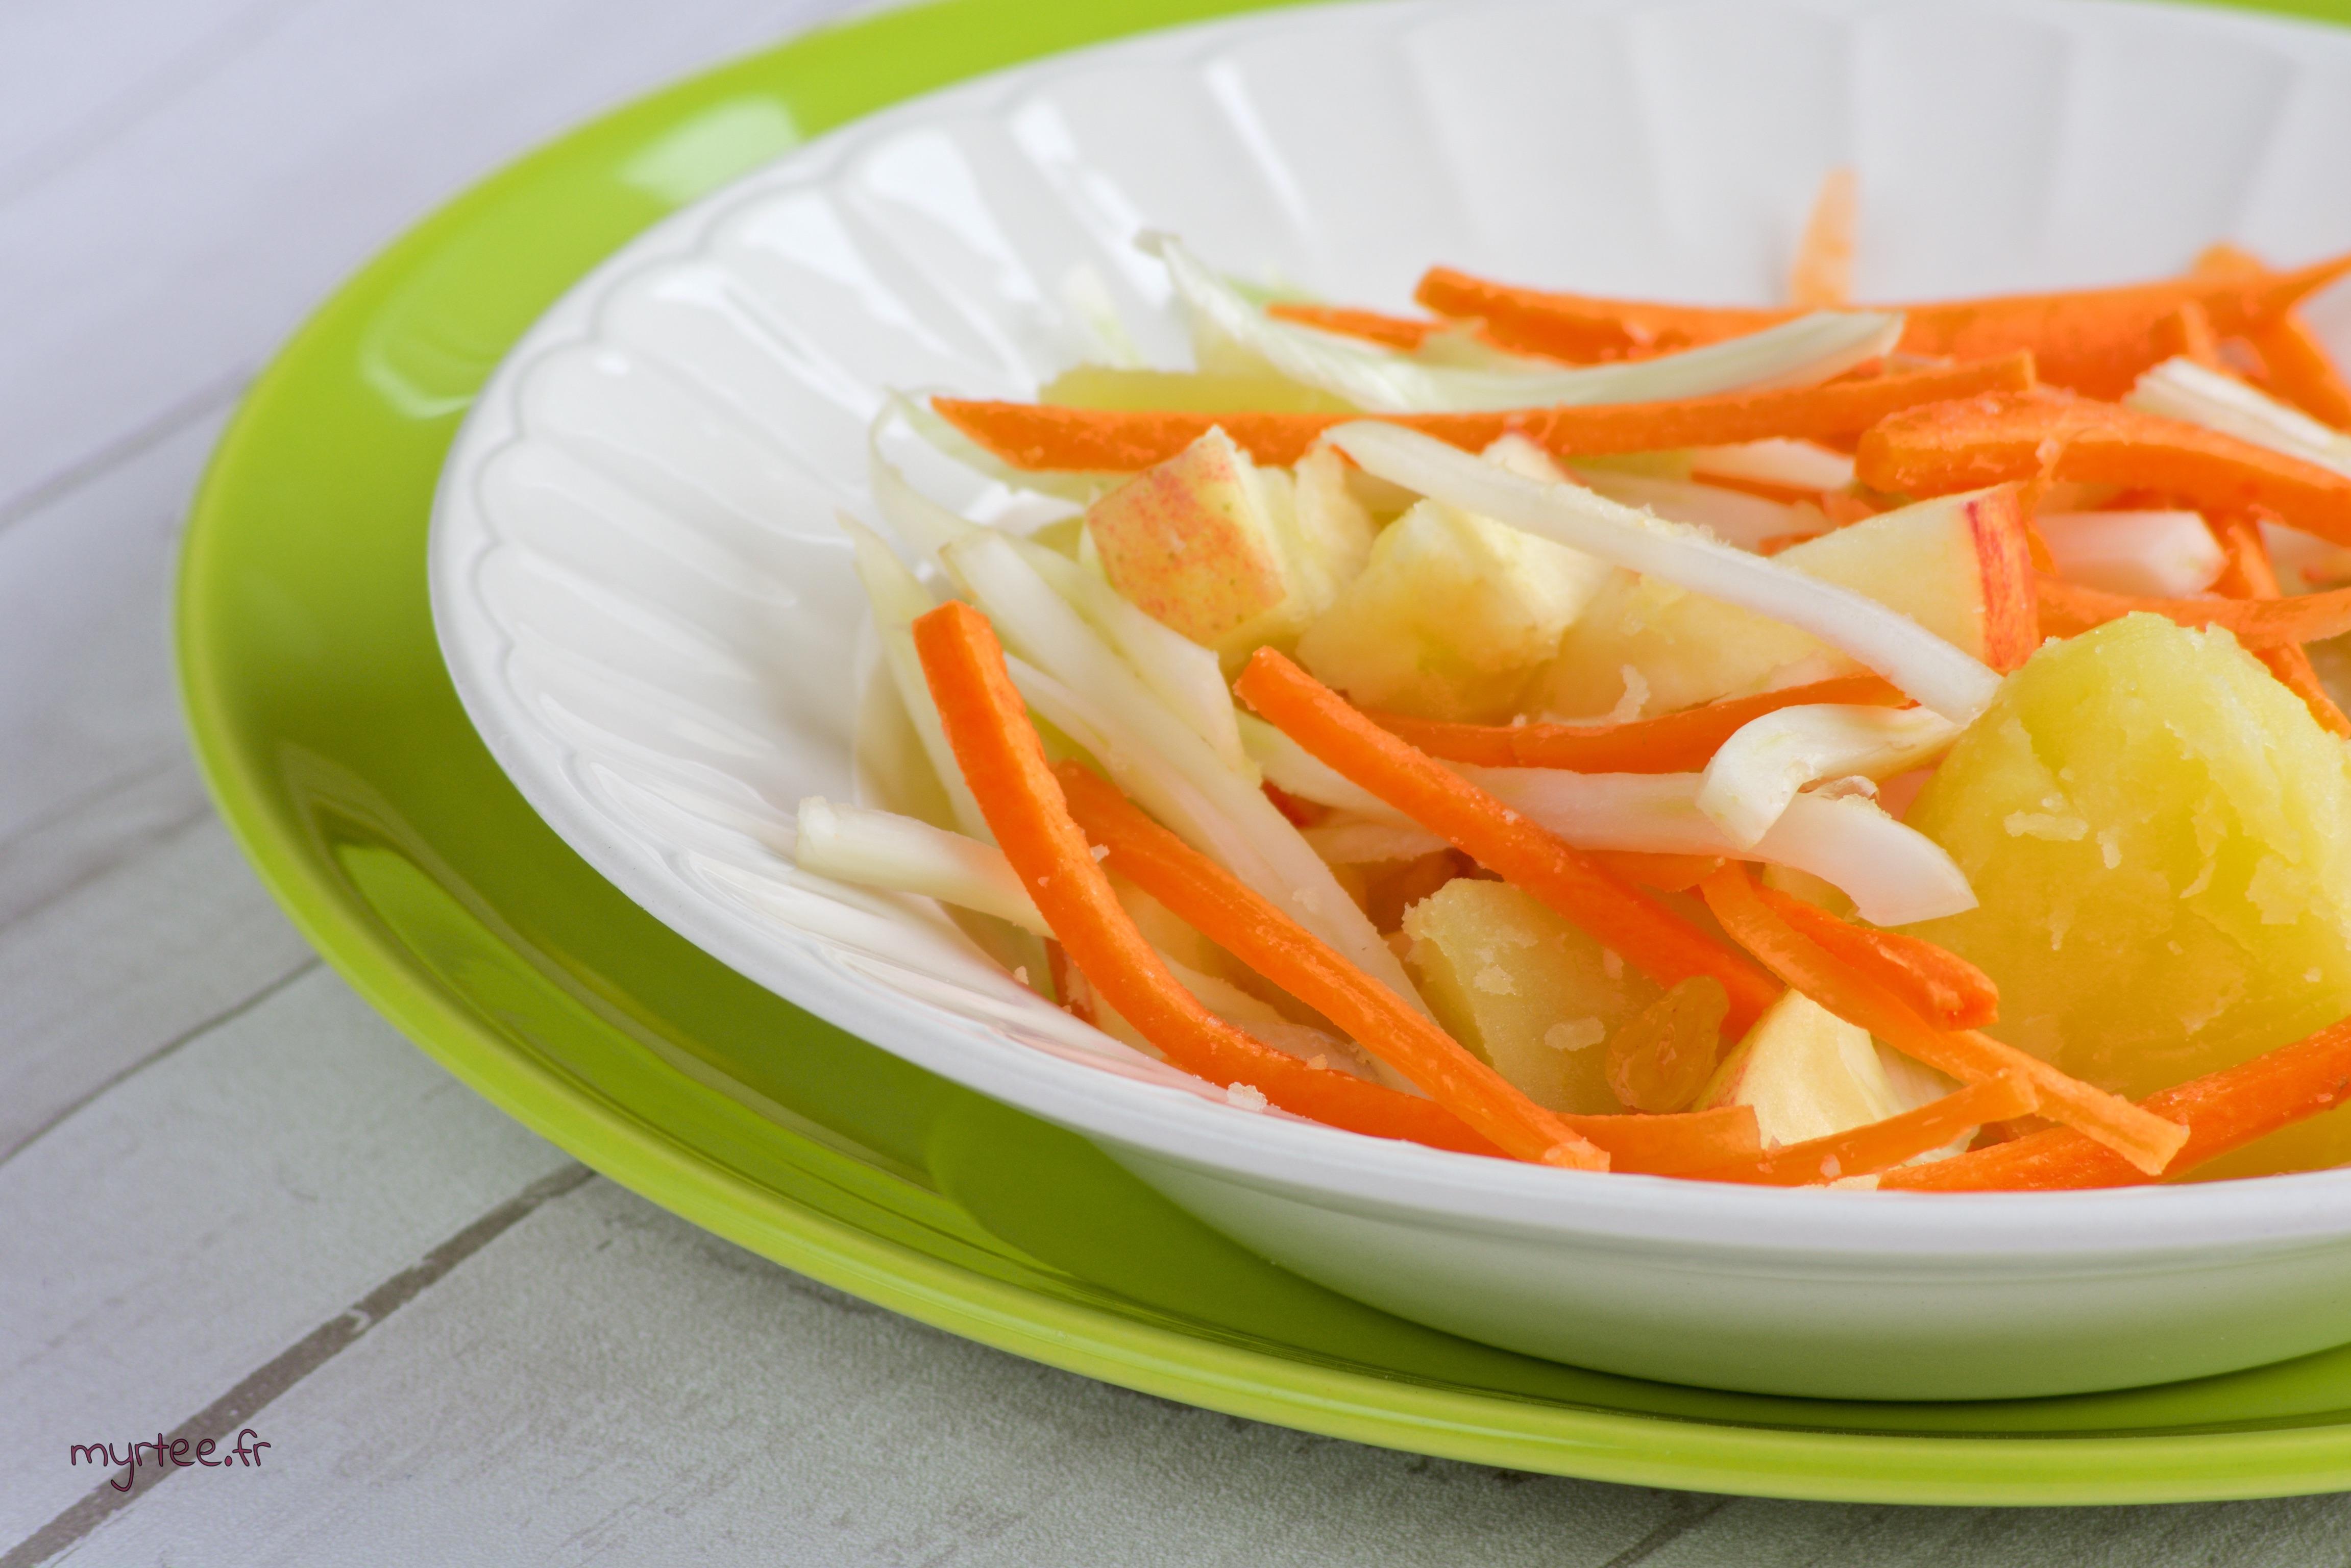 Une salade de fenouil (vegan)